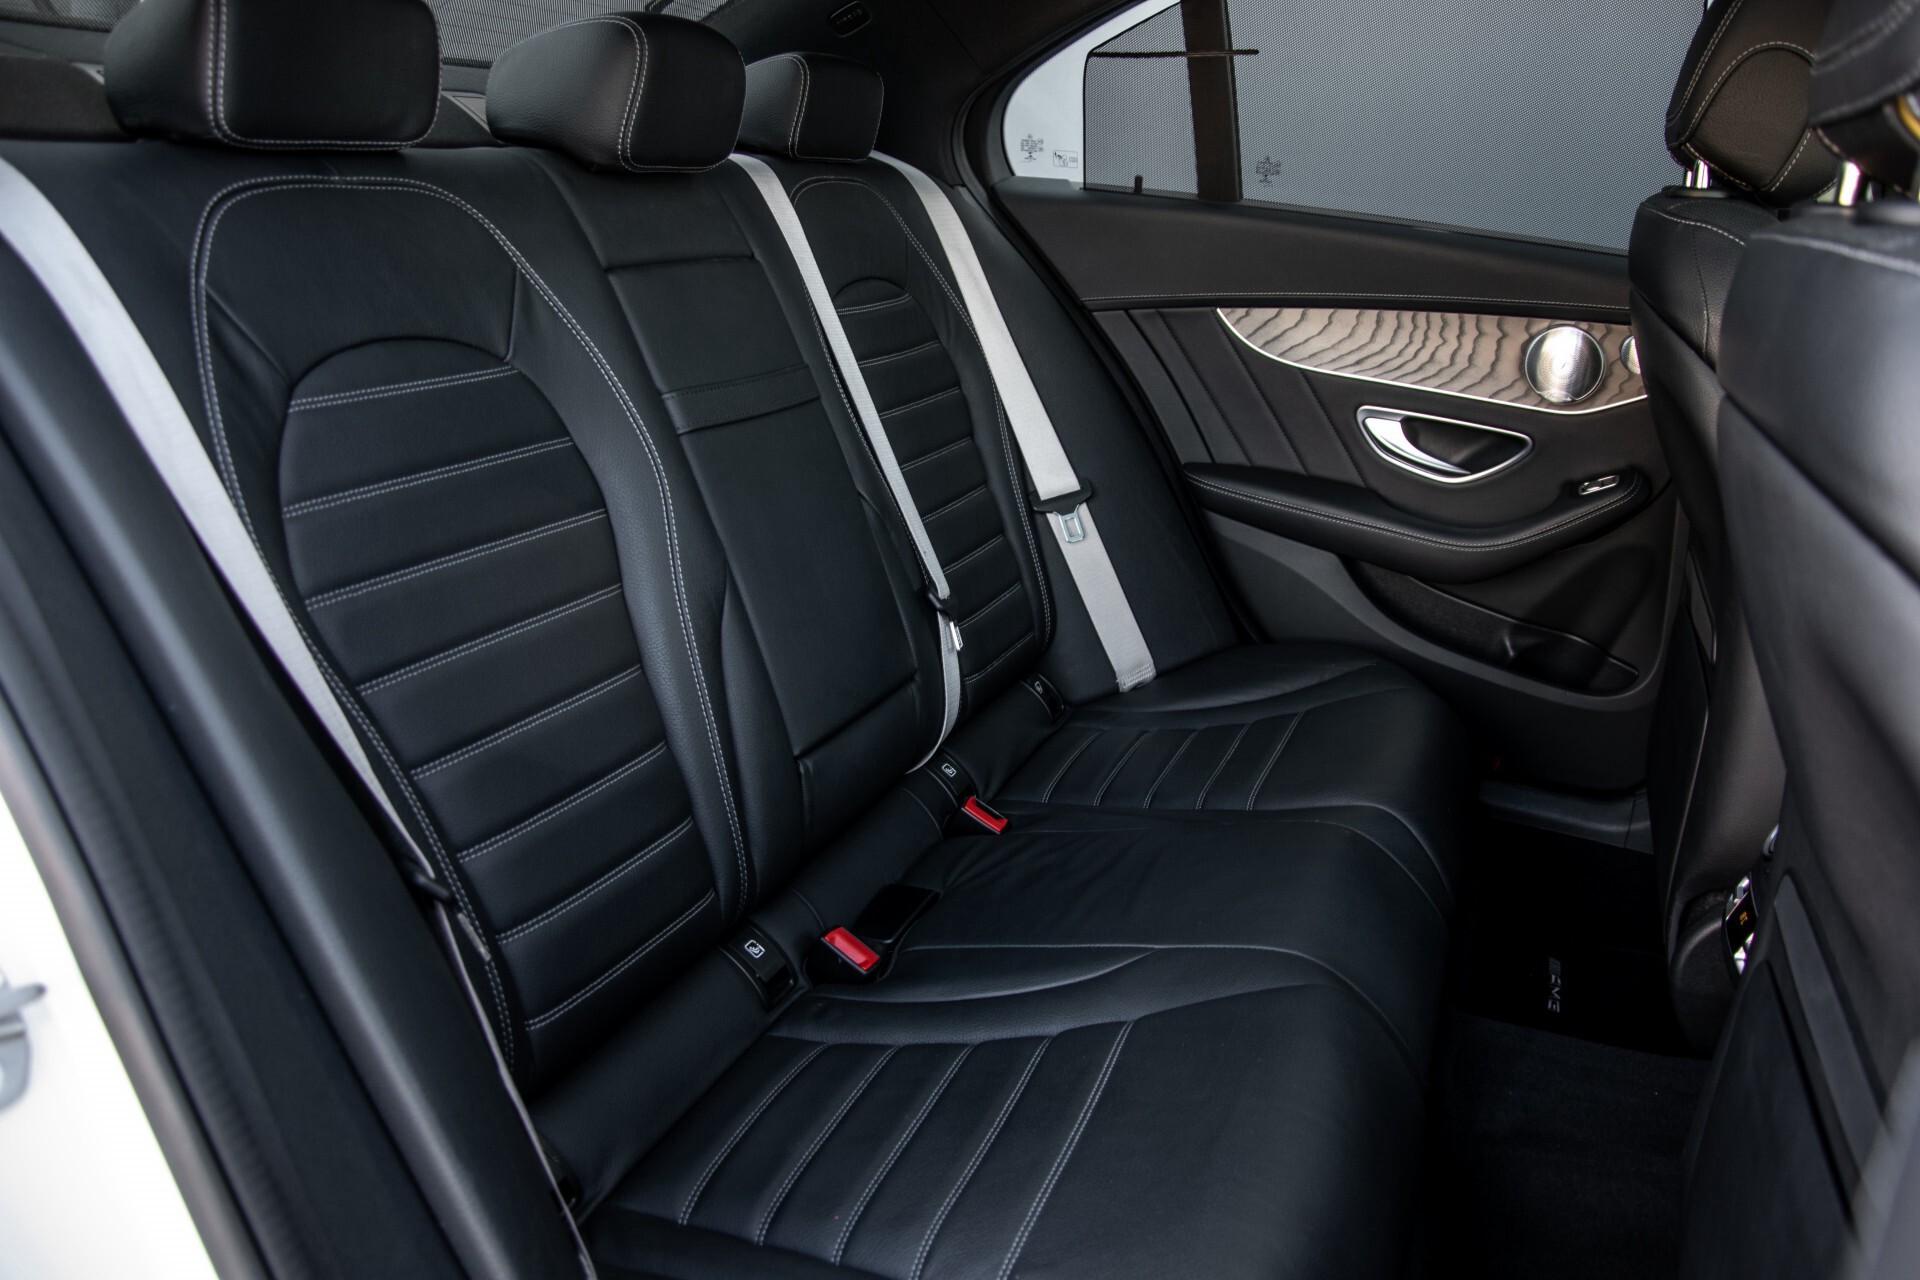 Mercedes-Benz C-Klasse 450/43 AMG 4-M Distronic/Standkachel/Panorama/Keyless/Harman-Kardon/Stoelkoeling Aut7 Foto 4